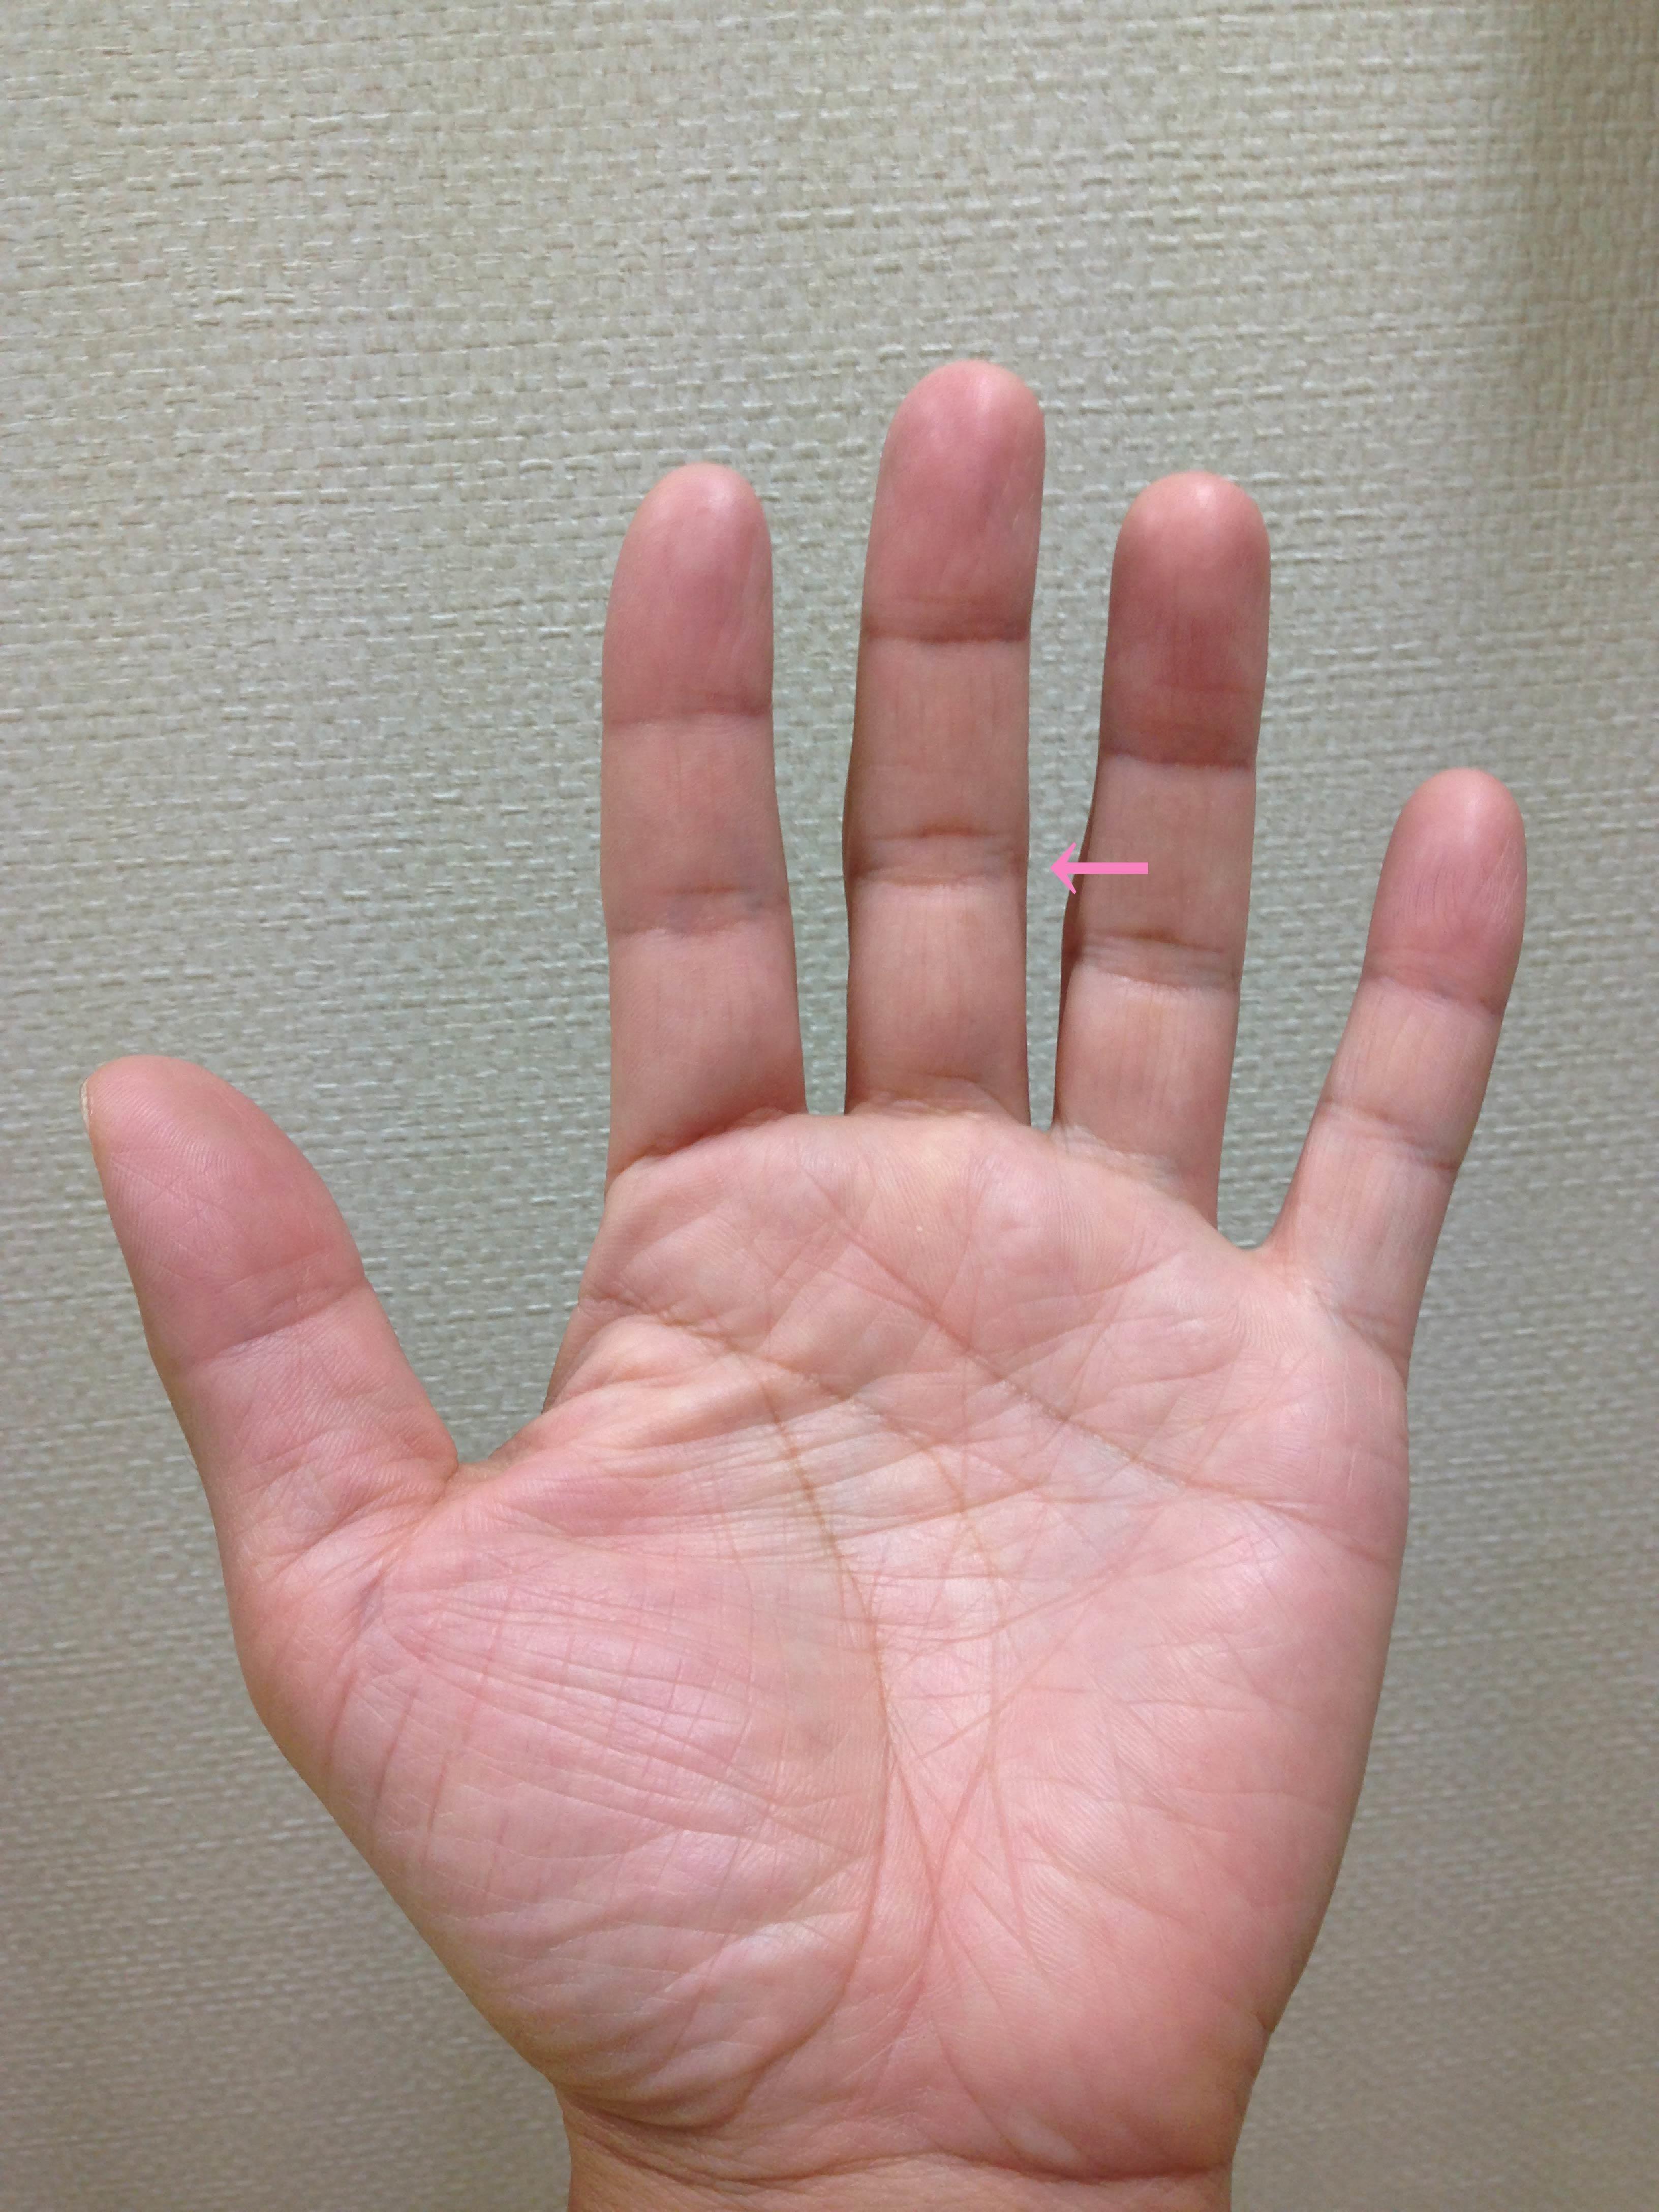 「突き指」「掌側板損傷」